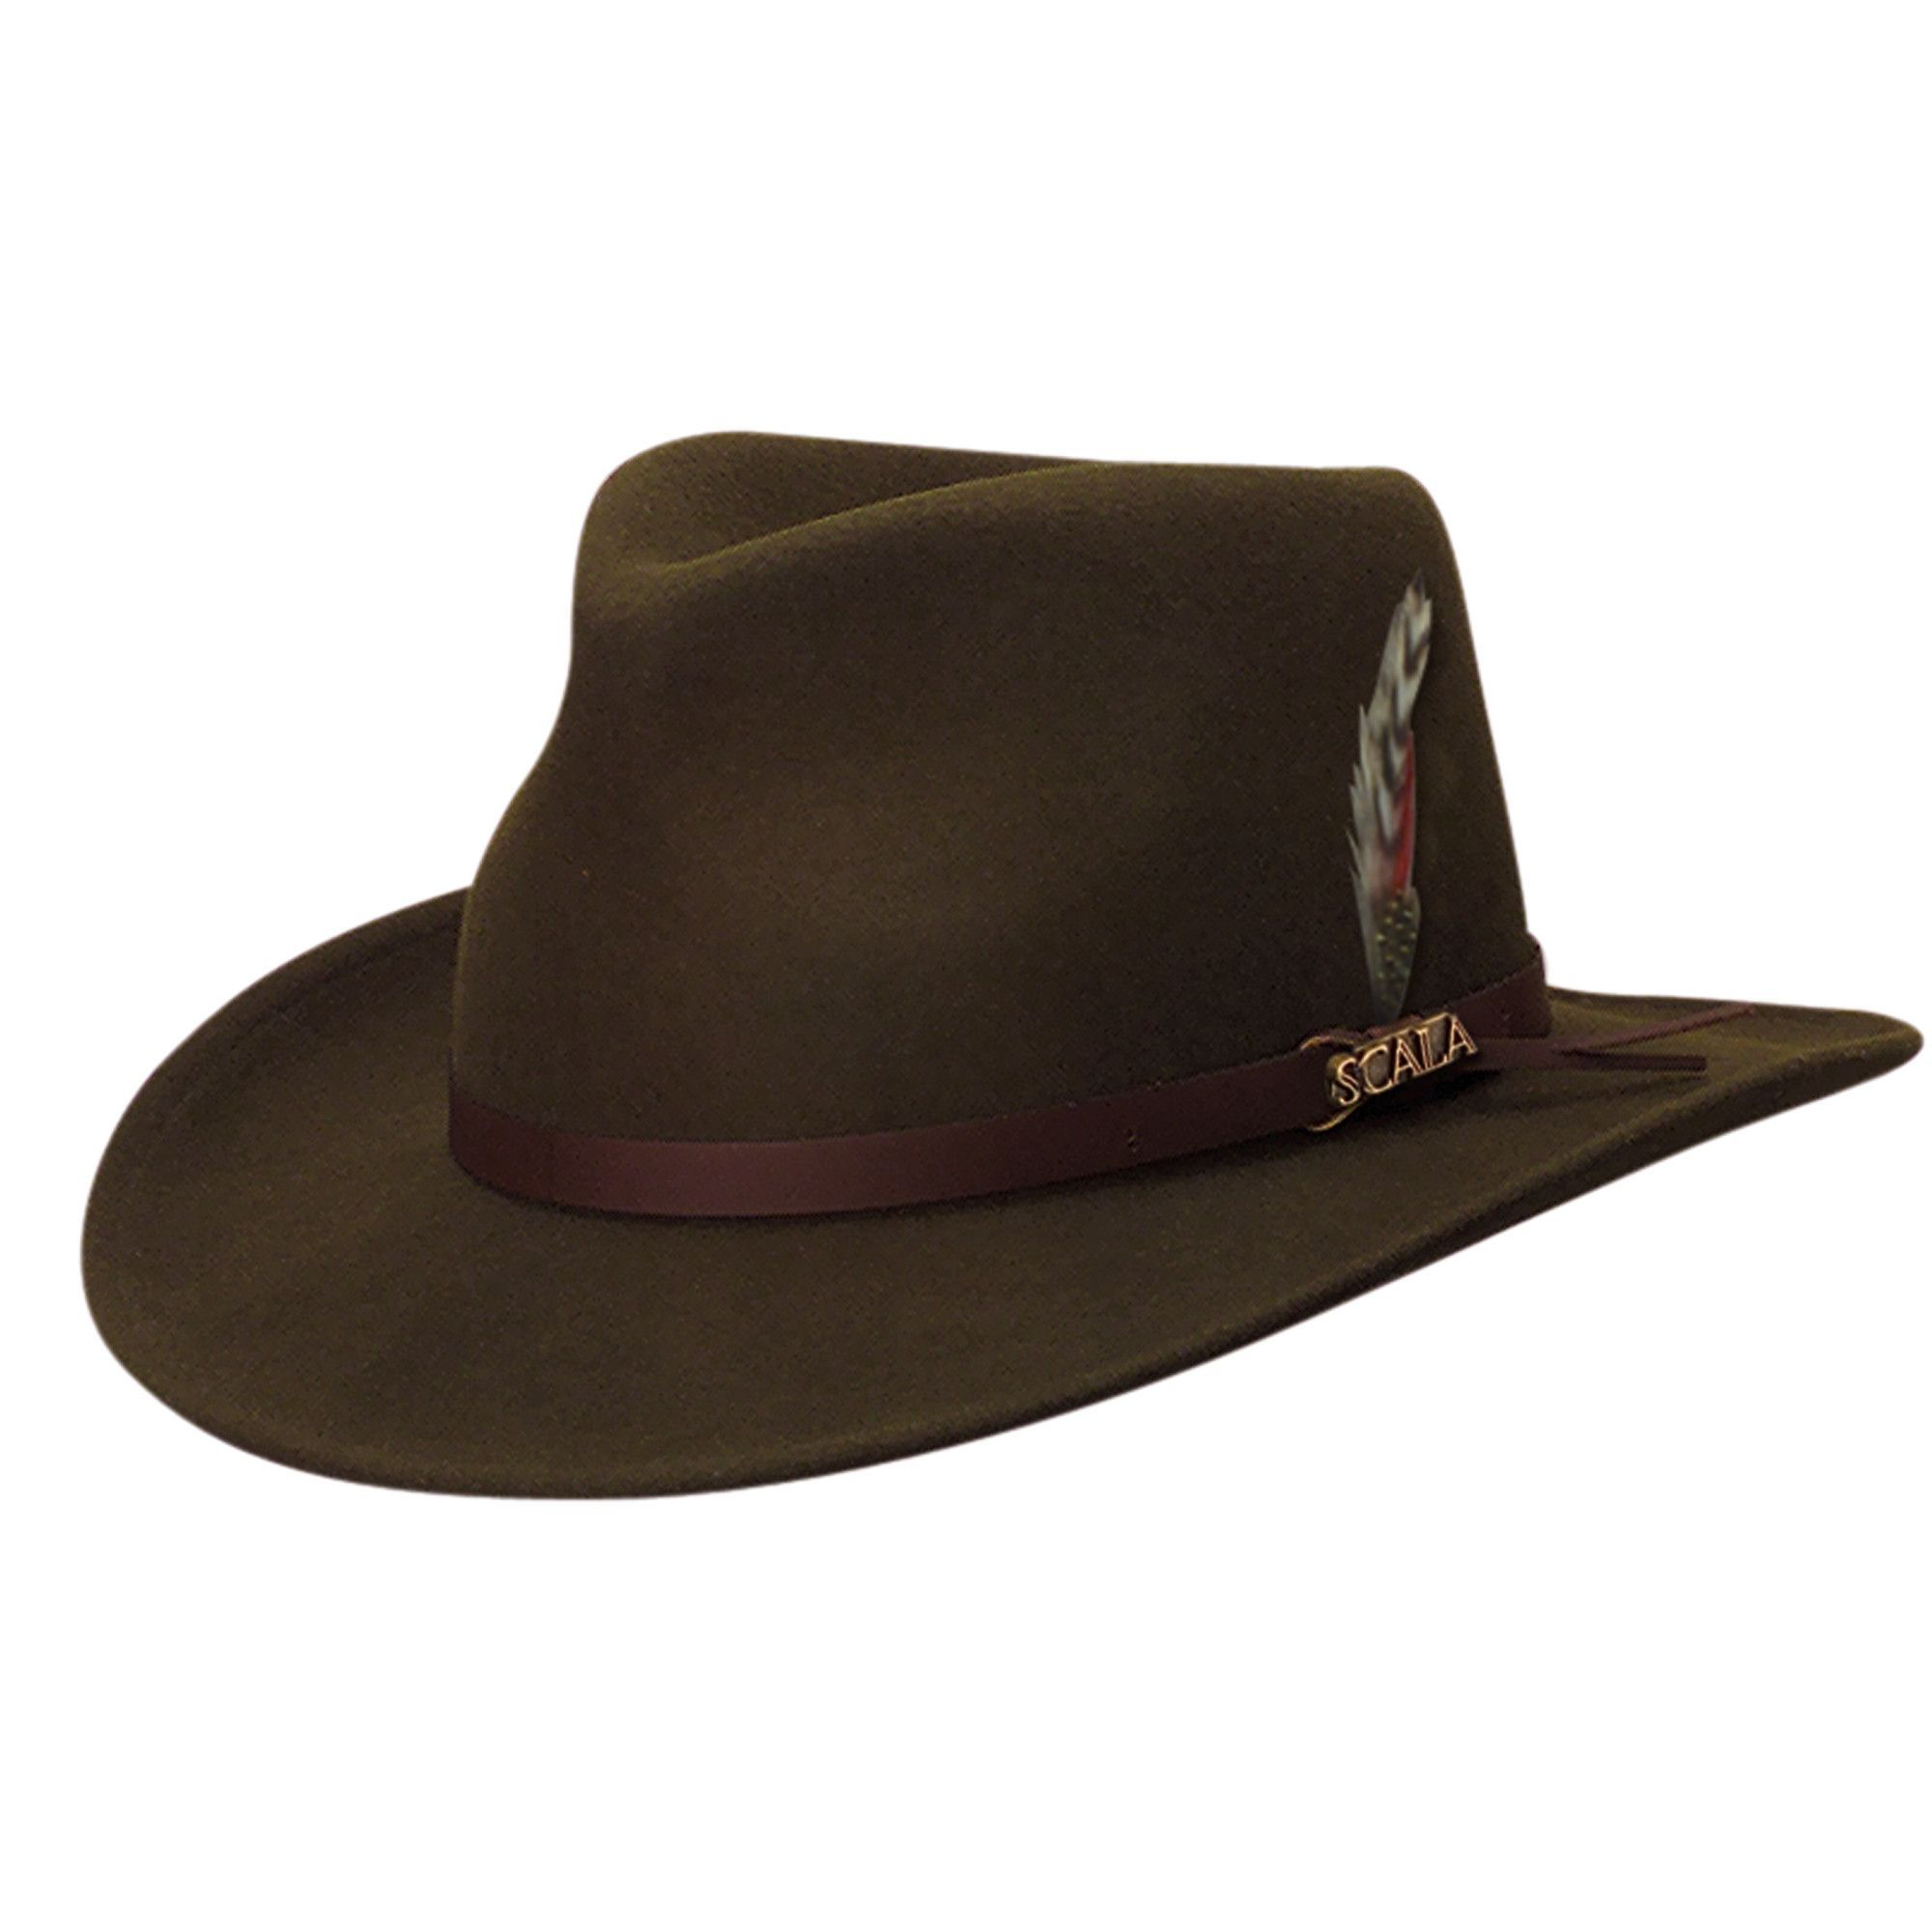 dfda025e036 Scala Men s Wool Felt Water Repellent Crushable Fedora Hat